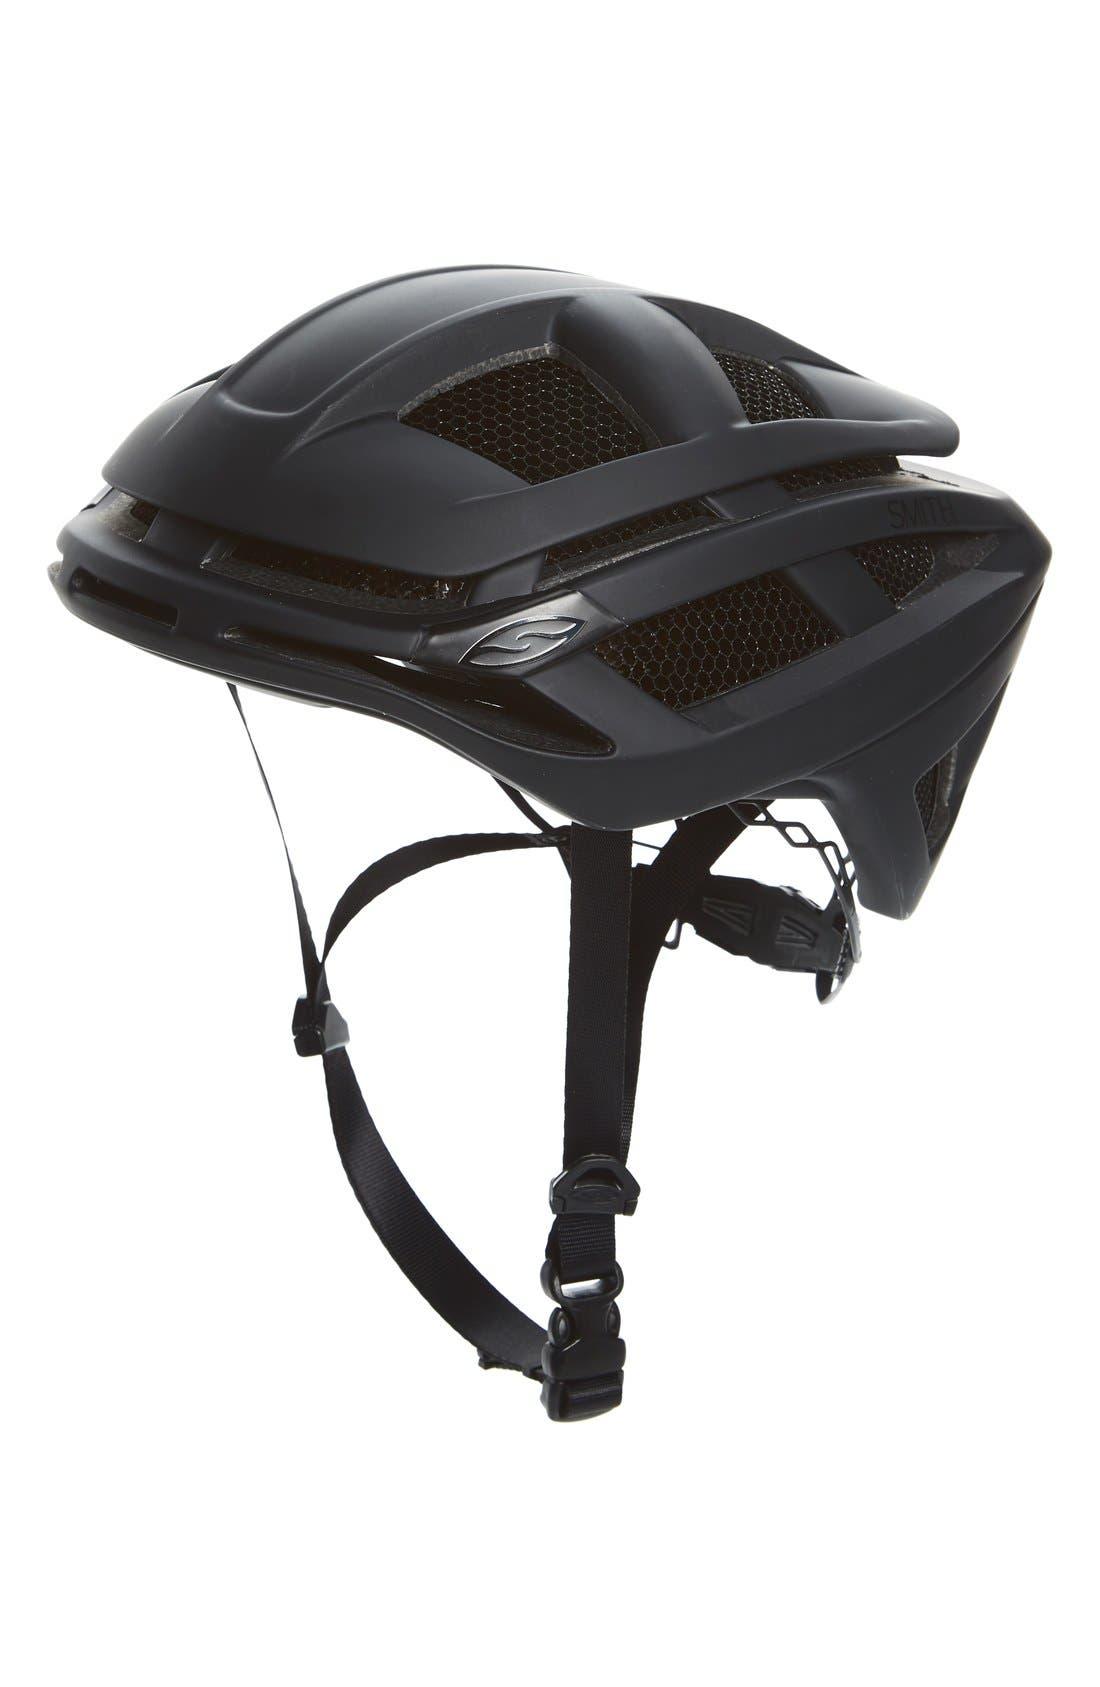 'Overtake With Aerocore(Tm) Featuring Koroyd' Biking Racer Helmet - Black, Matte Black